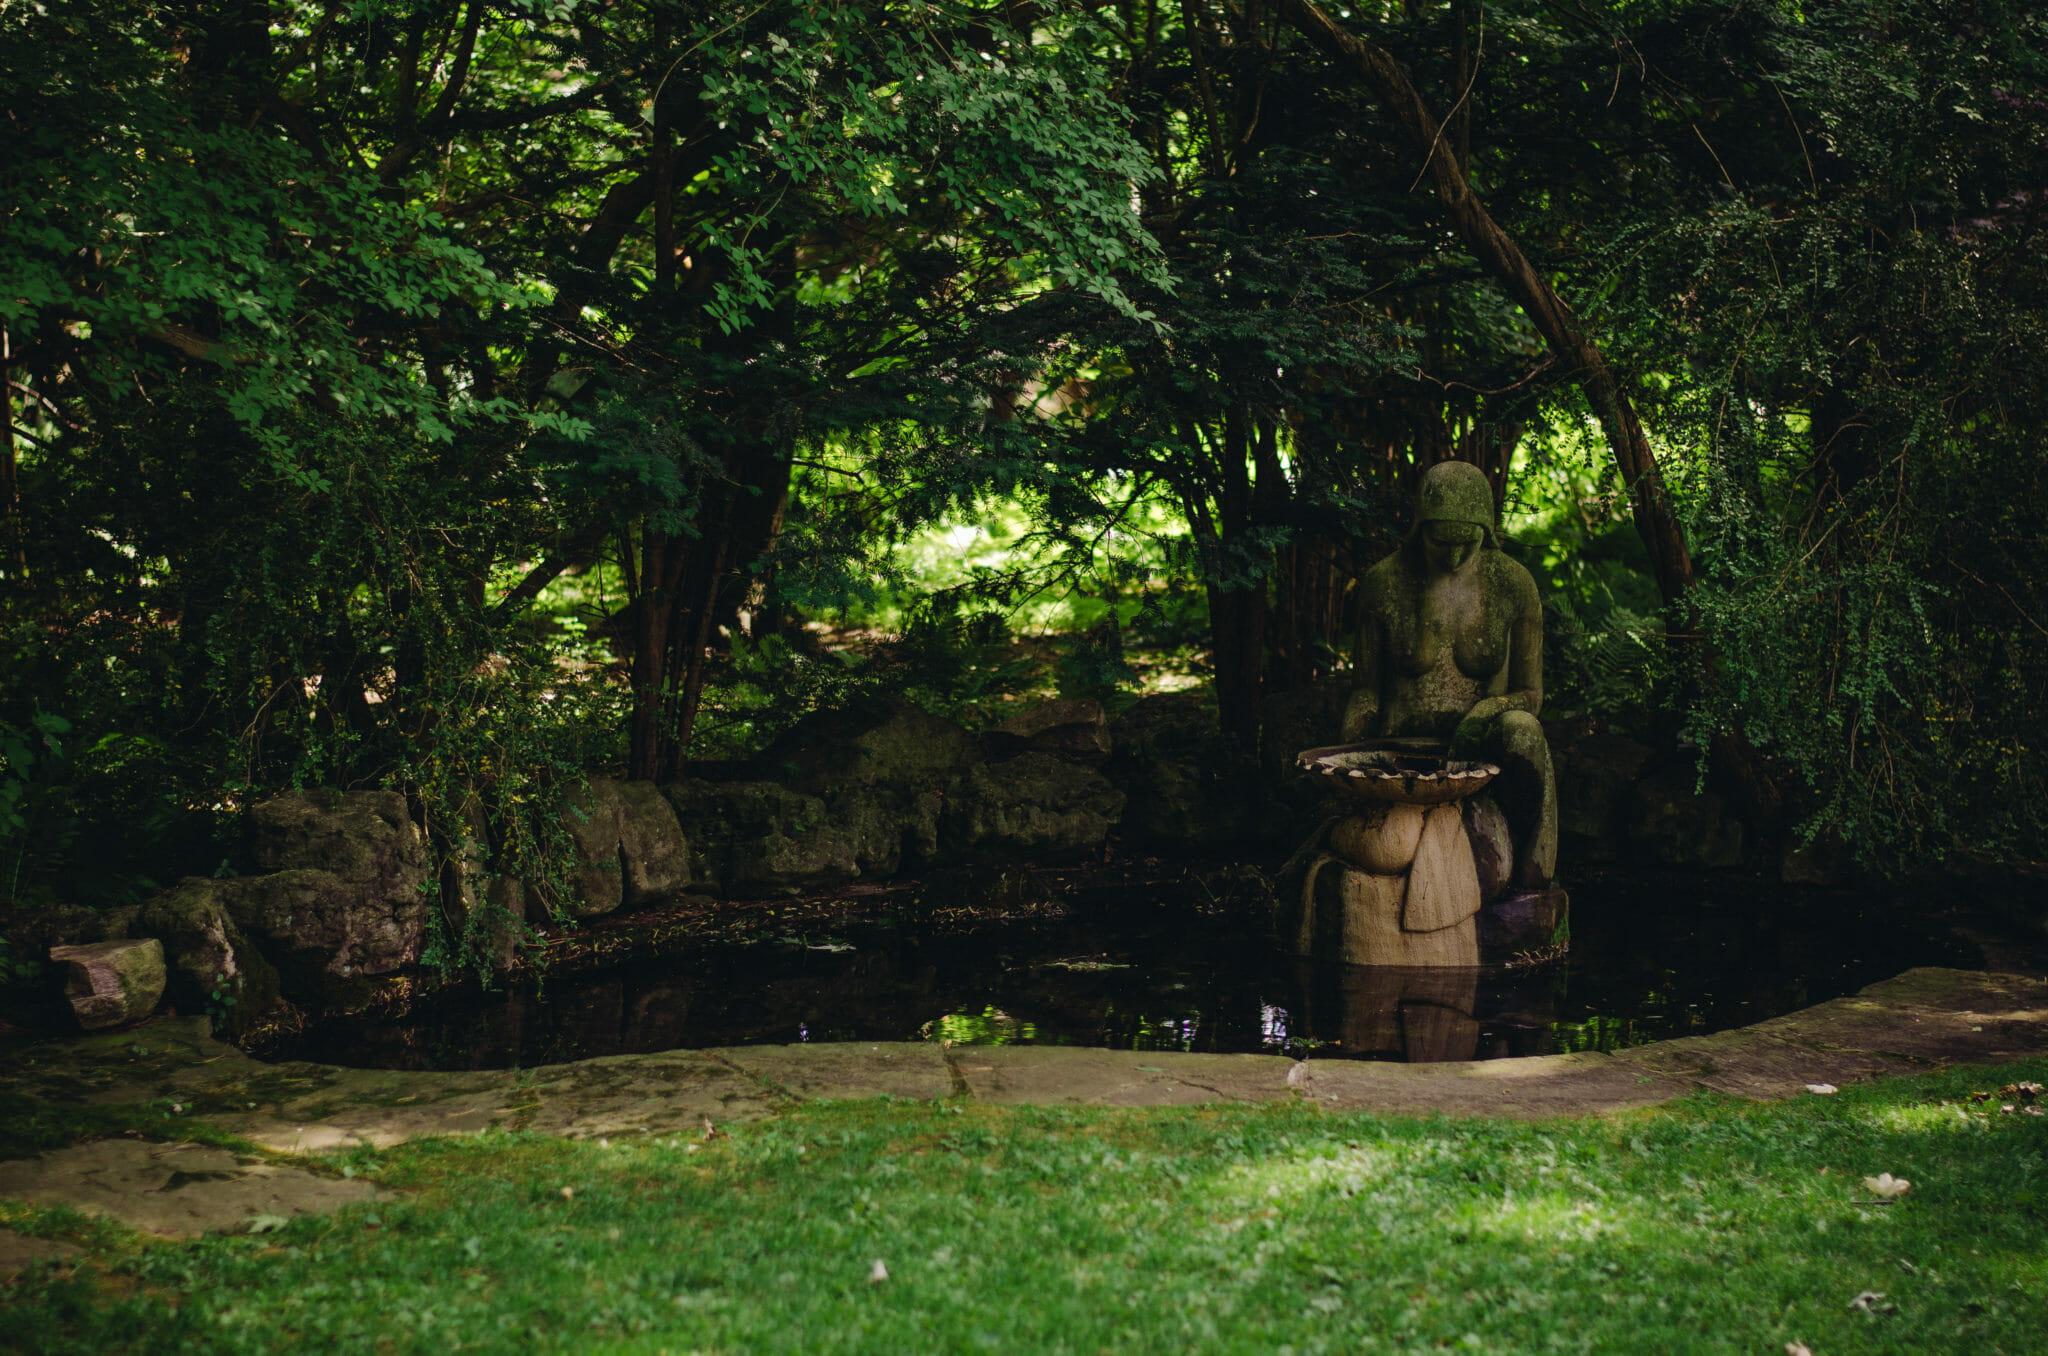 pond with fountain at parkwood oshawa